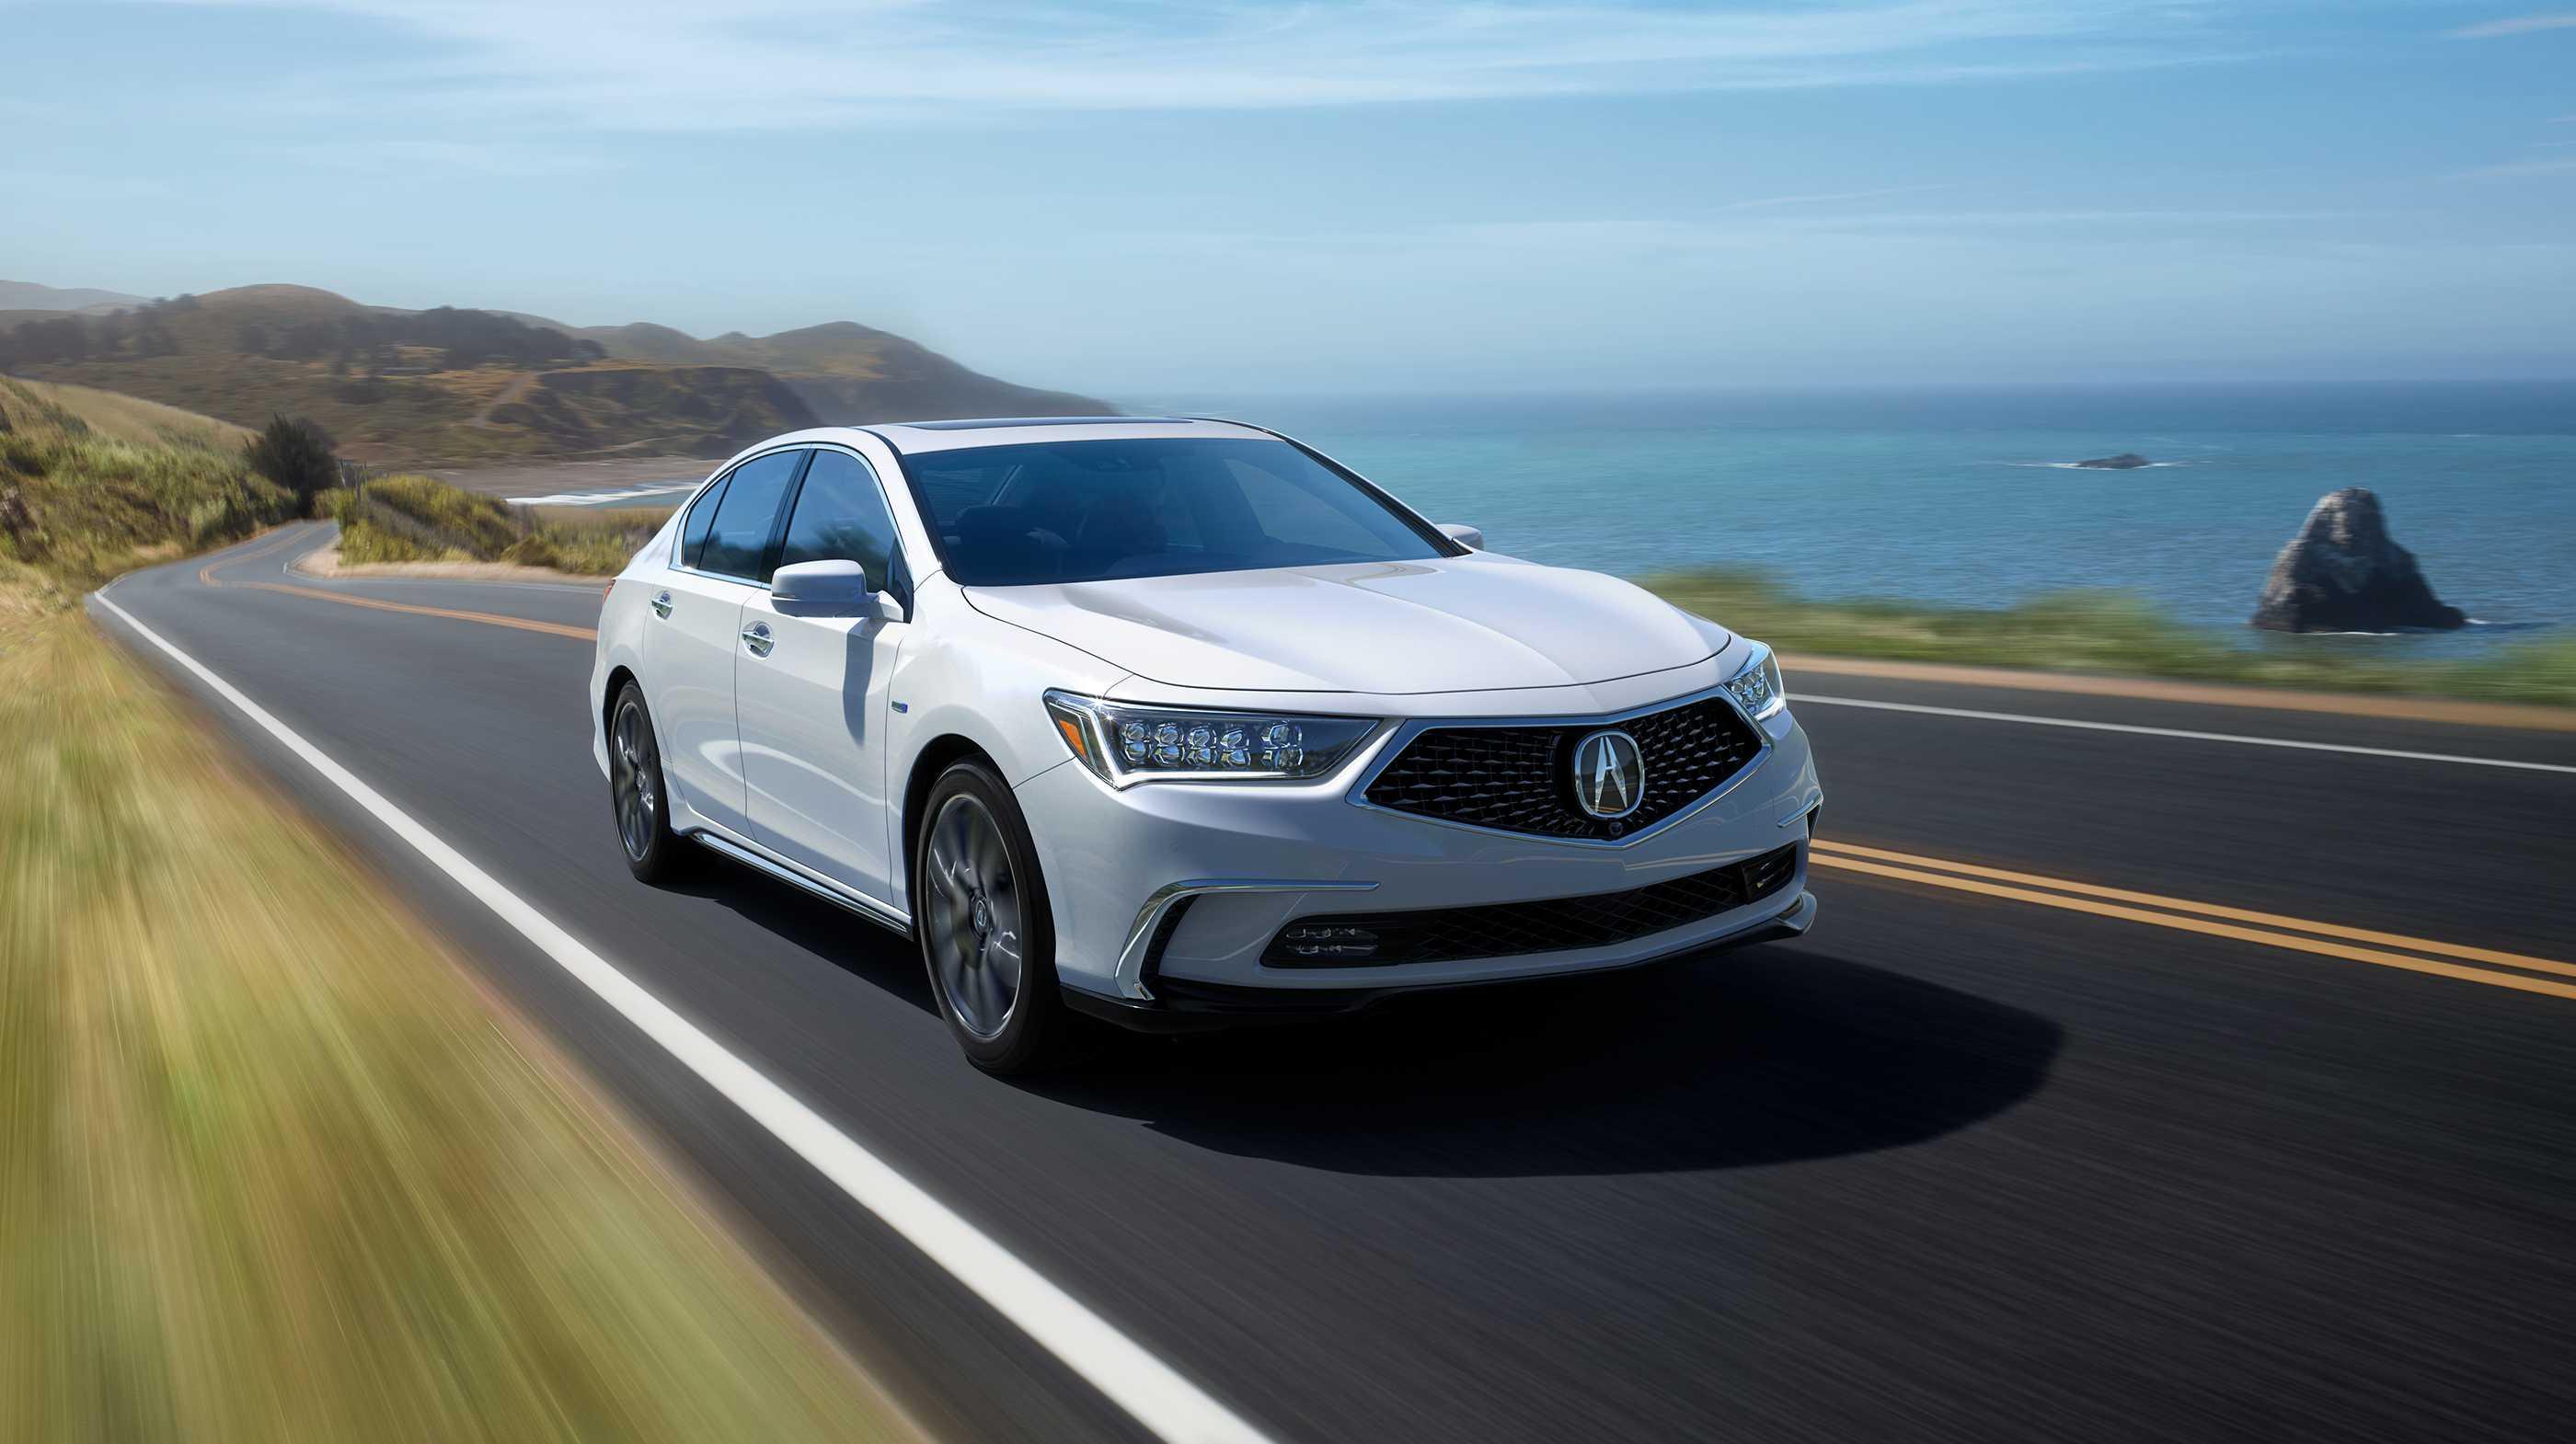 exterior rlx base sale acura sedan photos features for price reviews